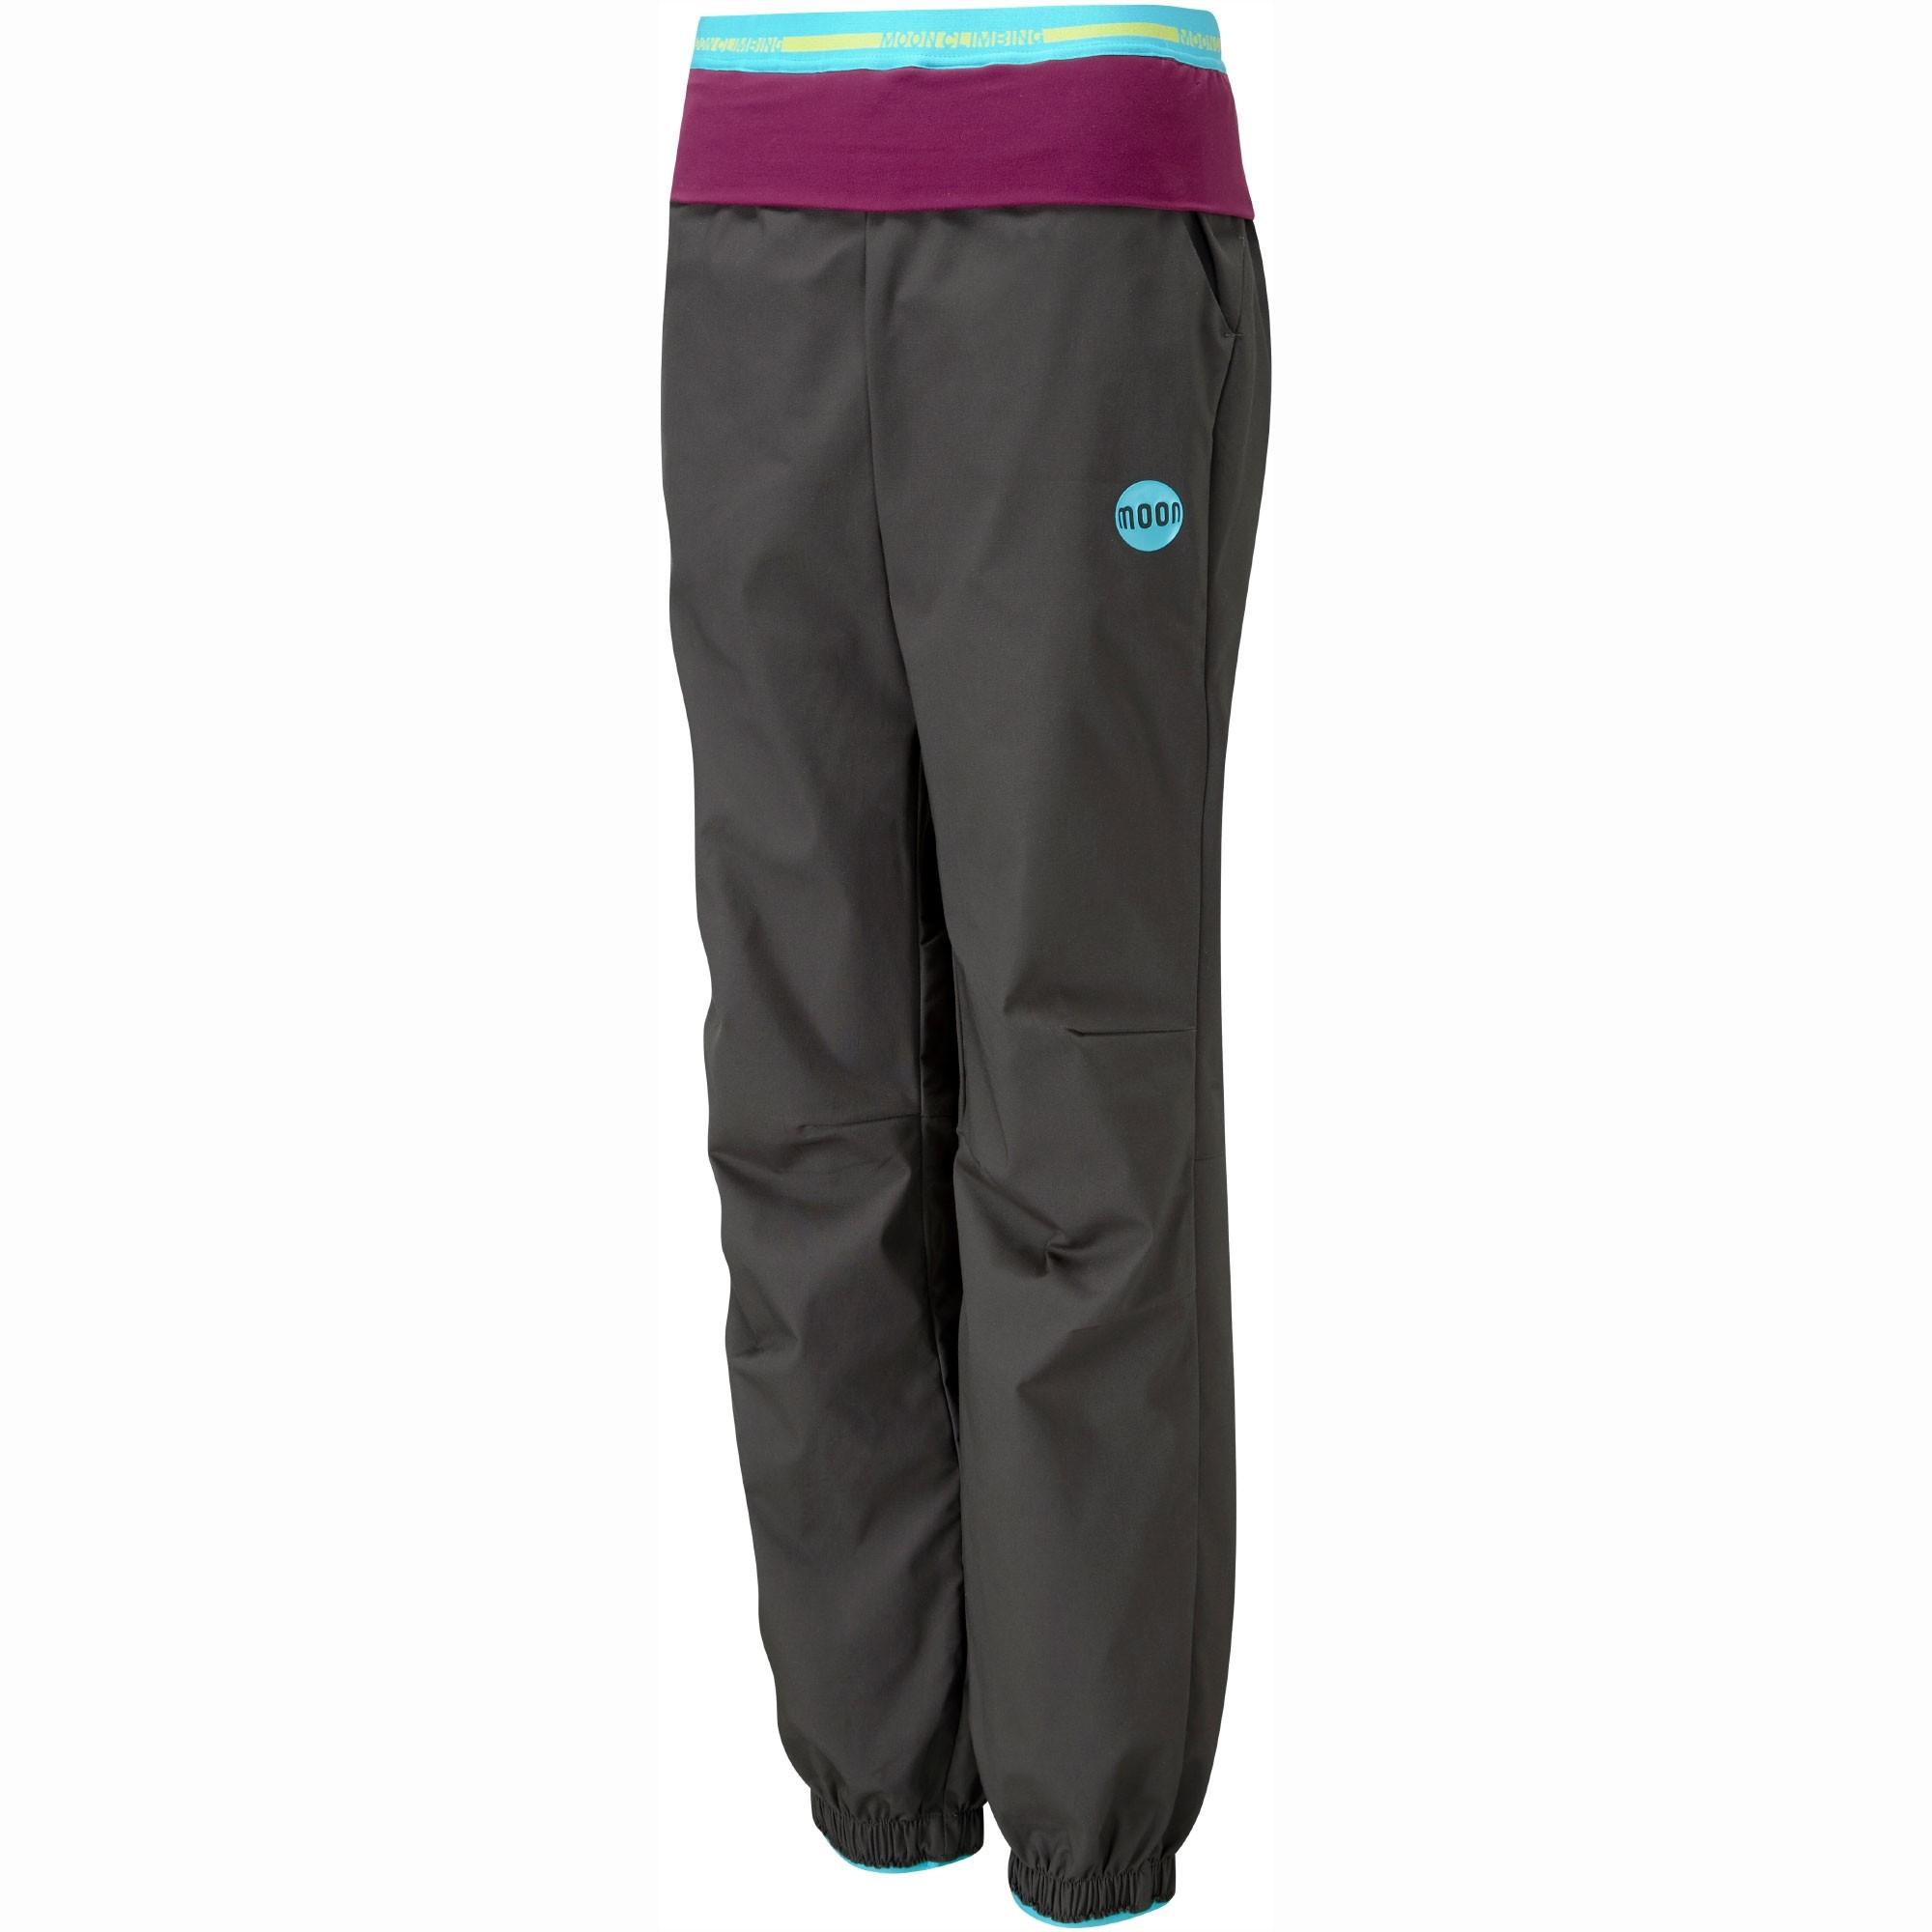 Moon Women's Samurai Pants - Charcoal - Front